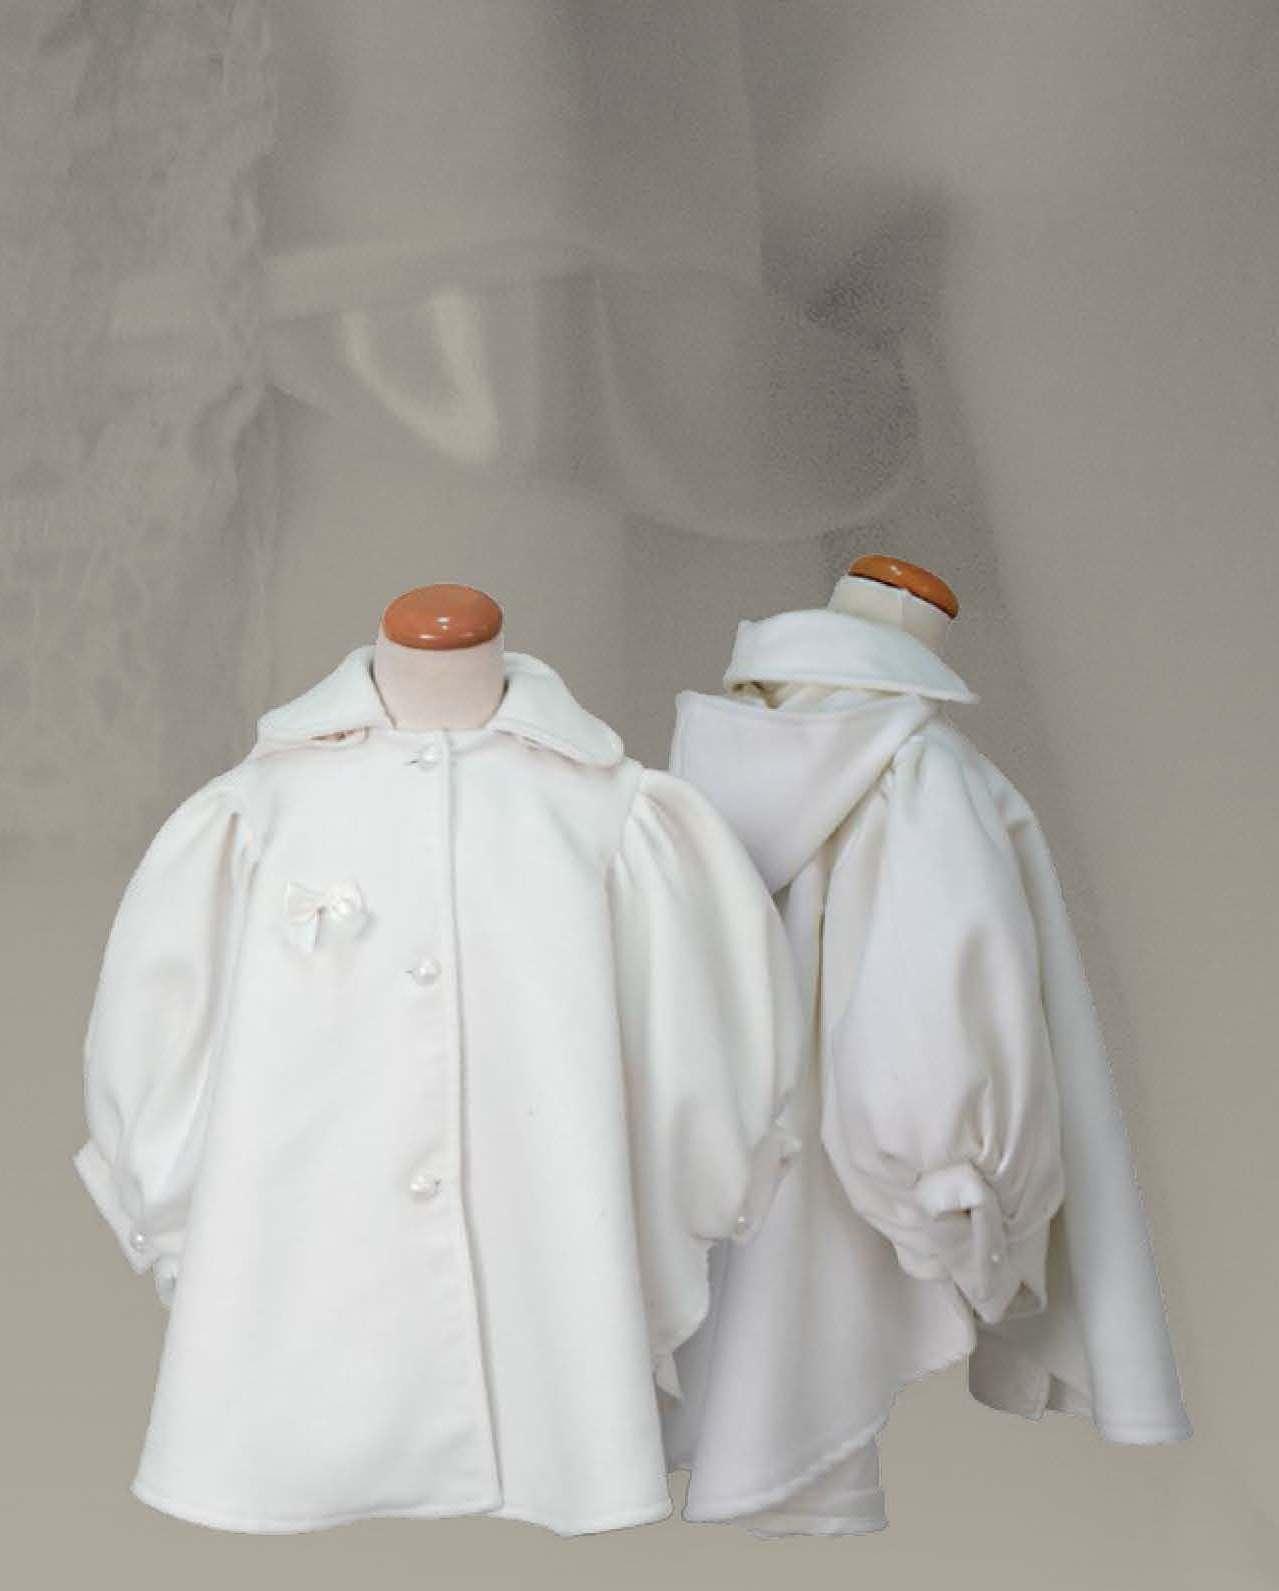 49ed099fa21 Βαπτιστικό Φόρεμα Δαντέλα με μοτίφ.- Βαπτιστικό Φόρεμα